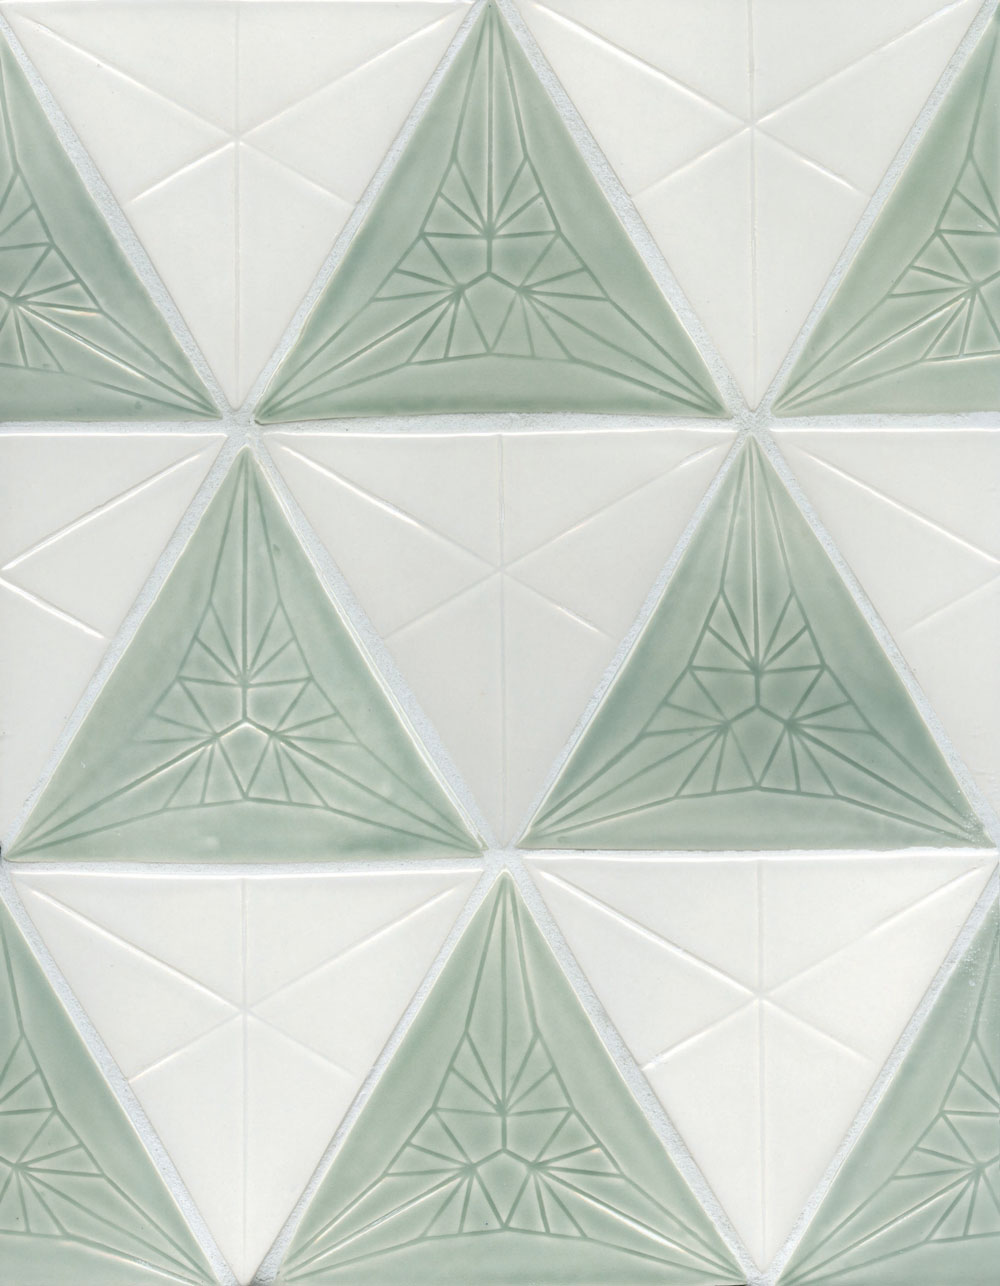 96--Symmetry_WEB.jpg